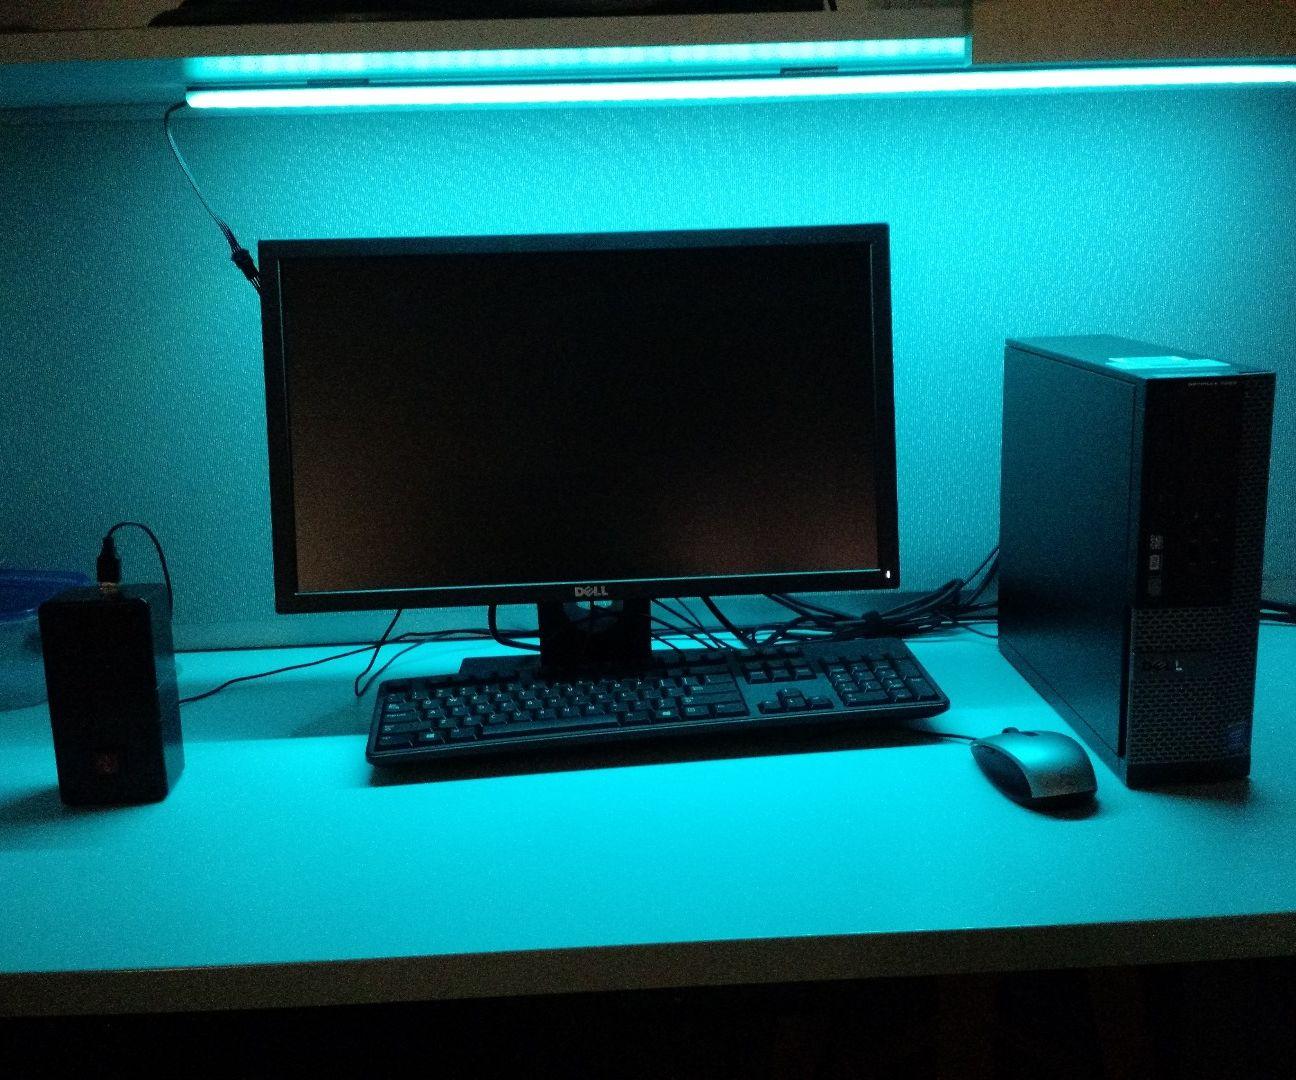 Convert Broken Desk Lamp to RGB LED